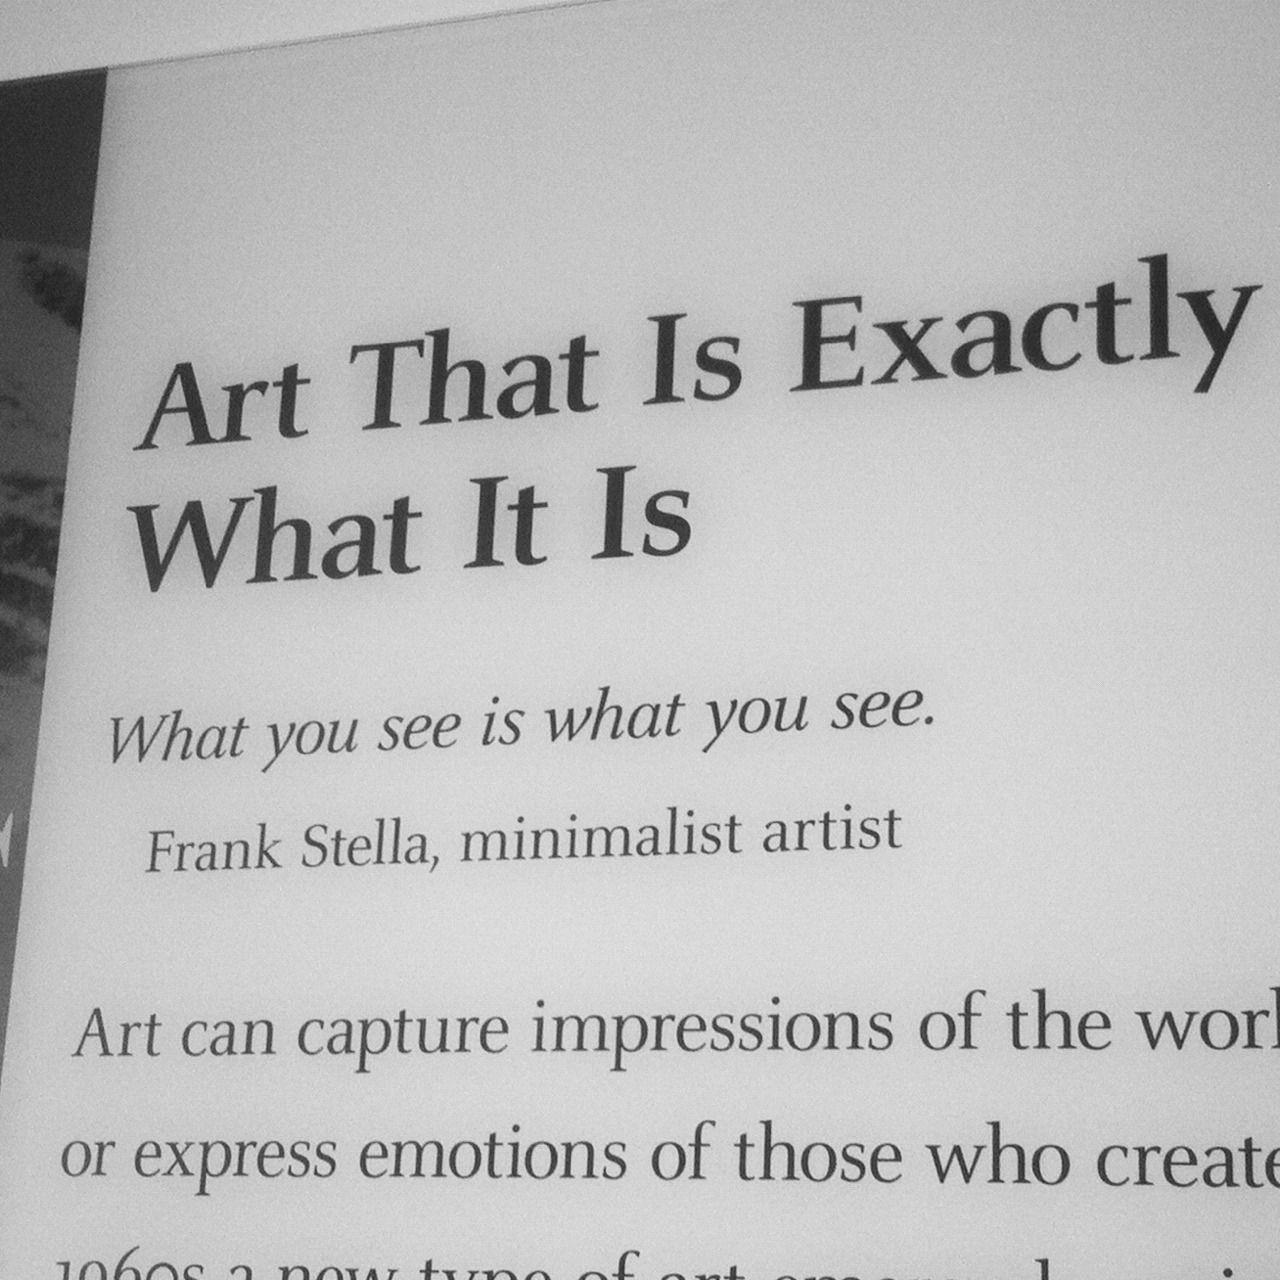 Taken at the Detroit Institute of Arts - #art #creativity #detroit #frank #gallery #minimalism #quotes #stella